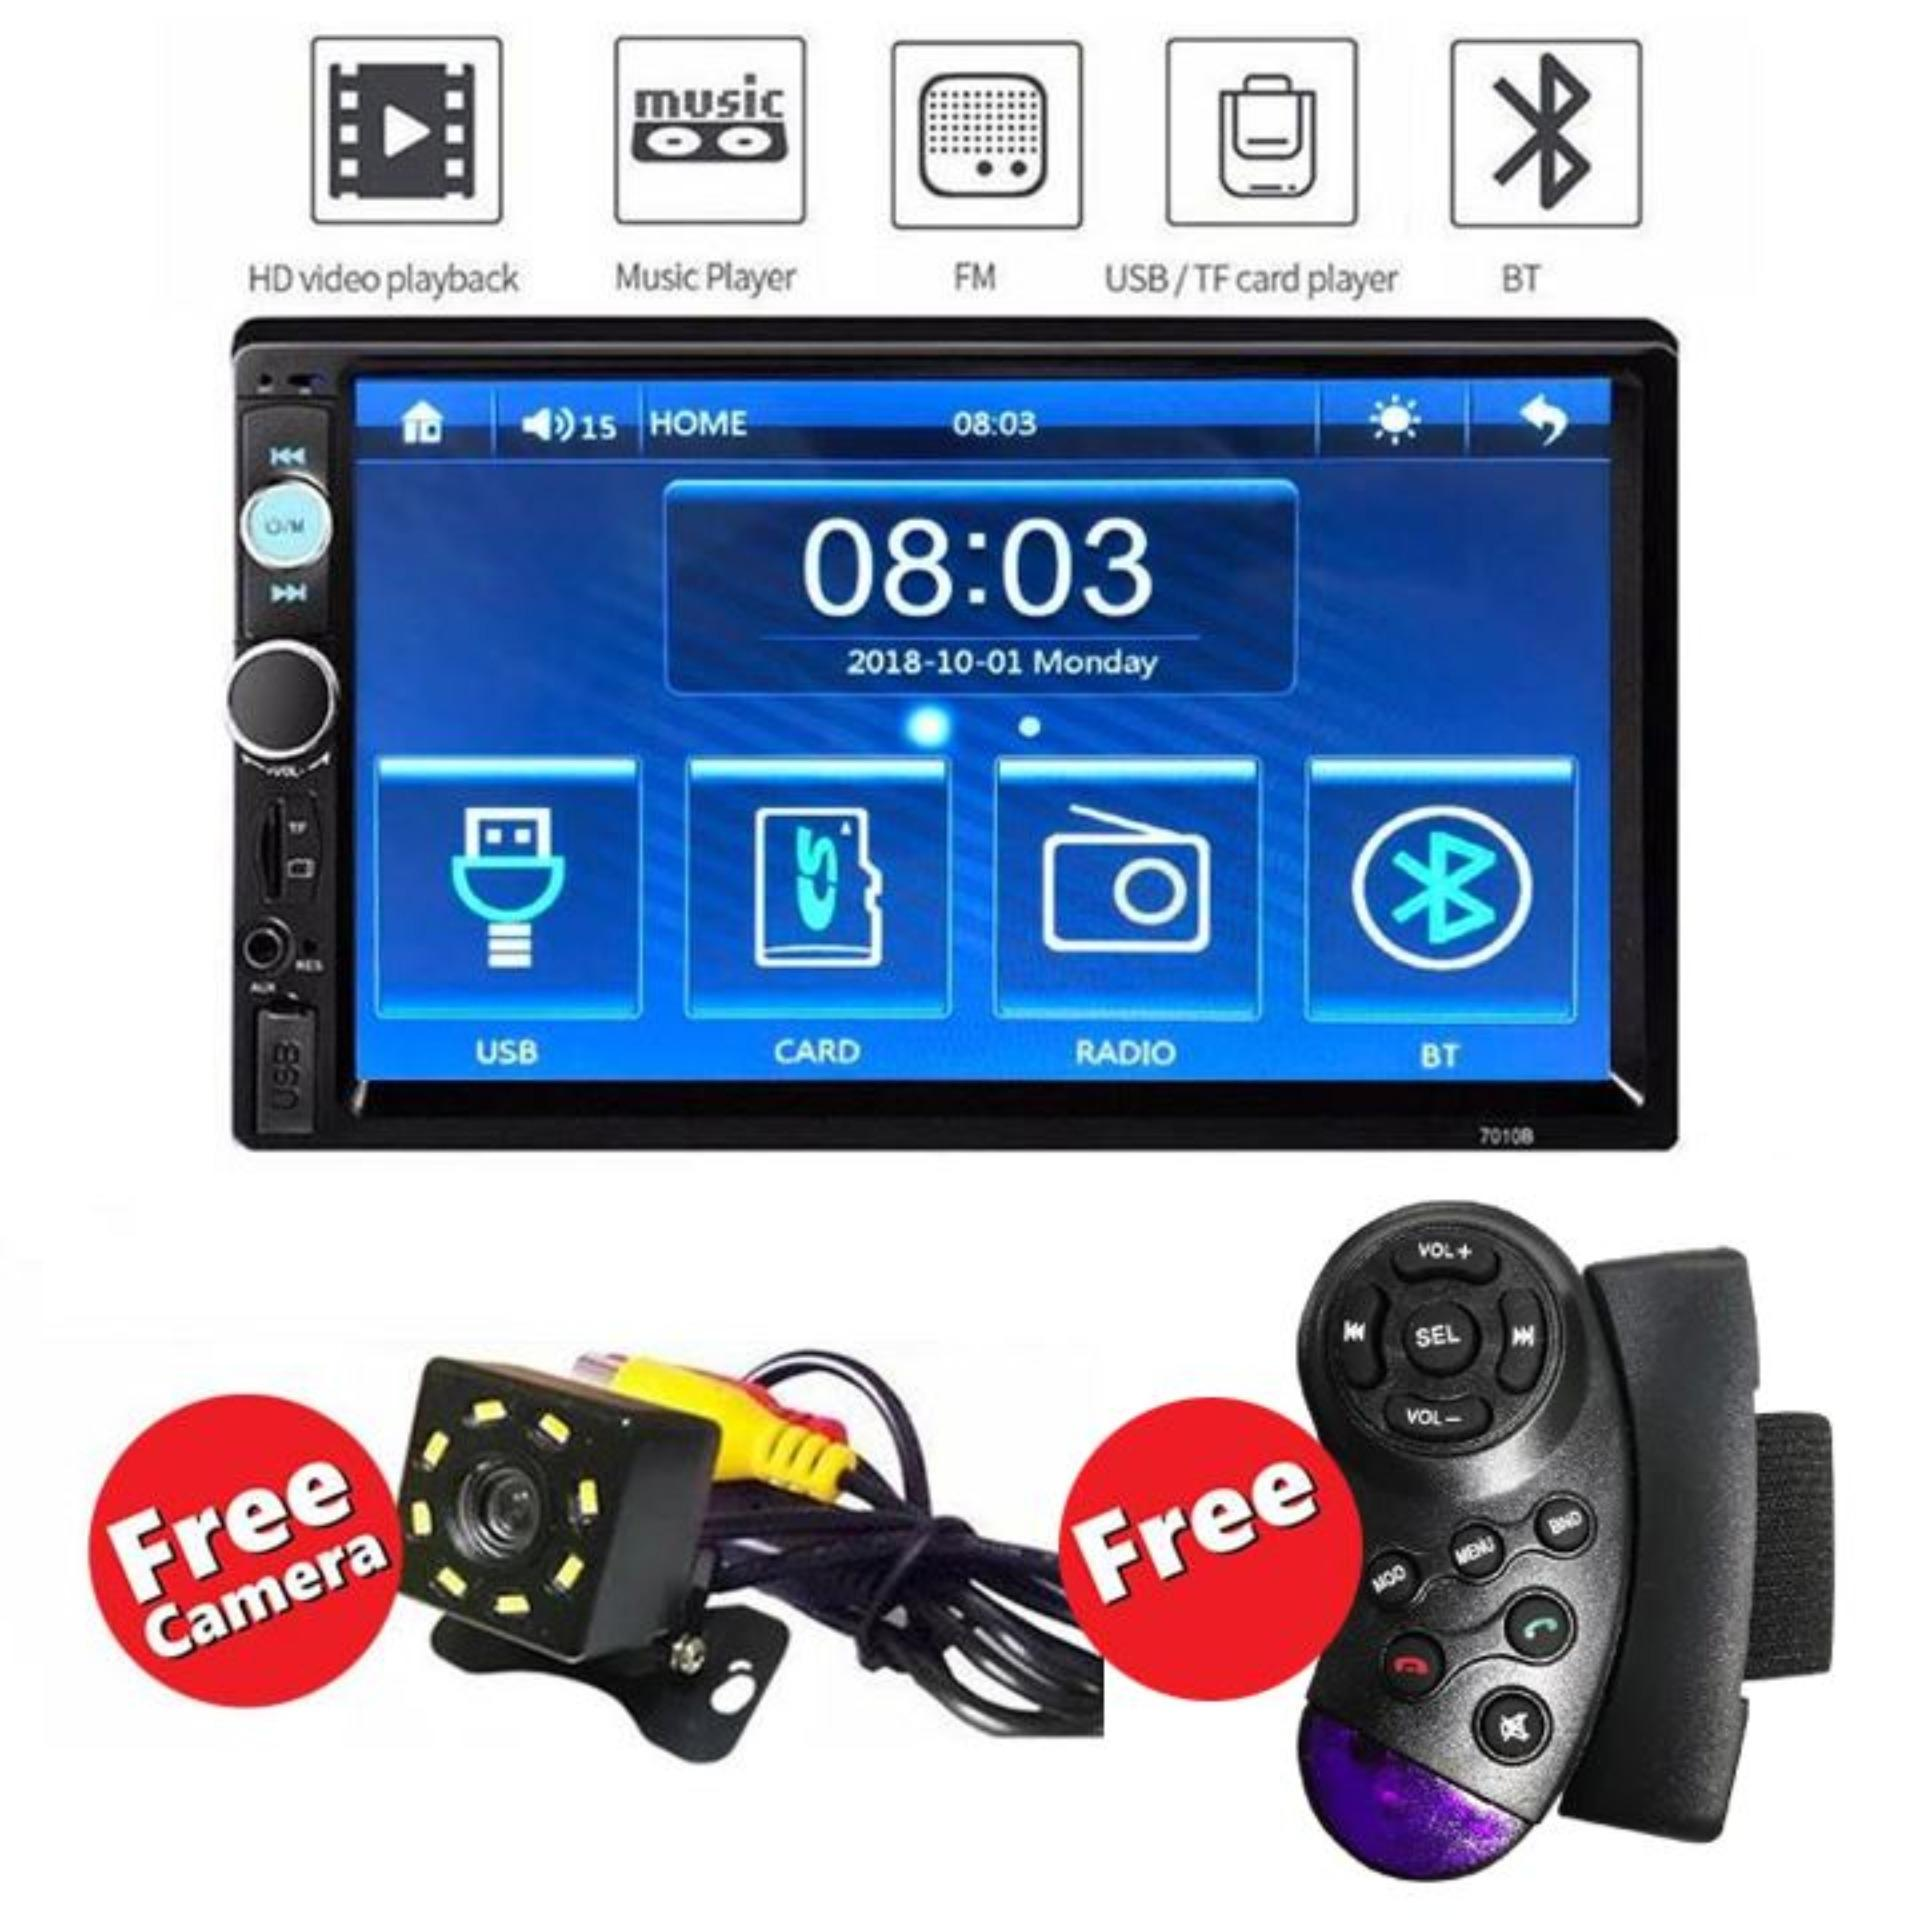 Fm radio gadgets for windows 7 free download   Peatix